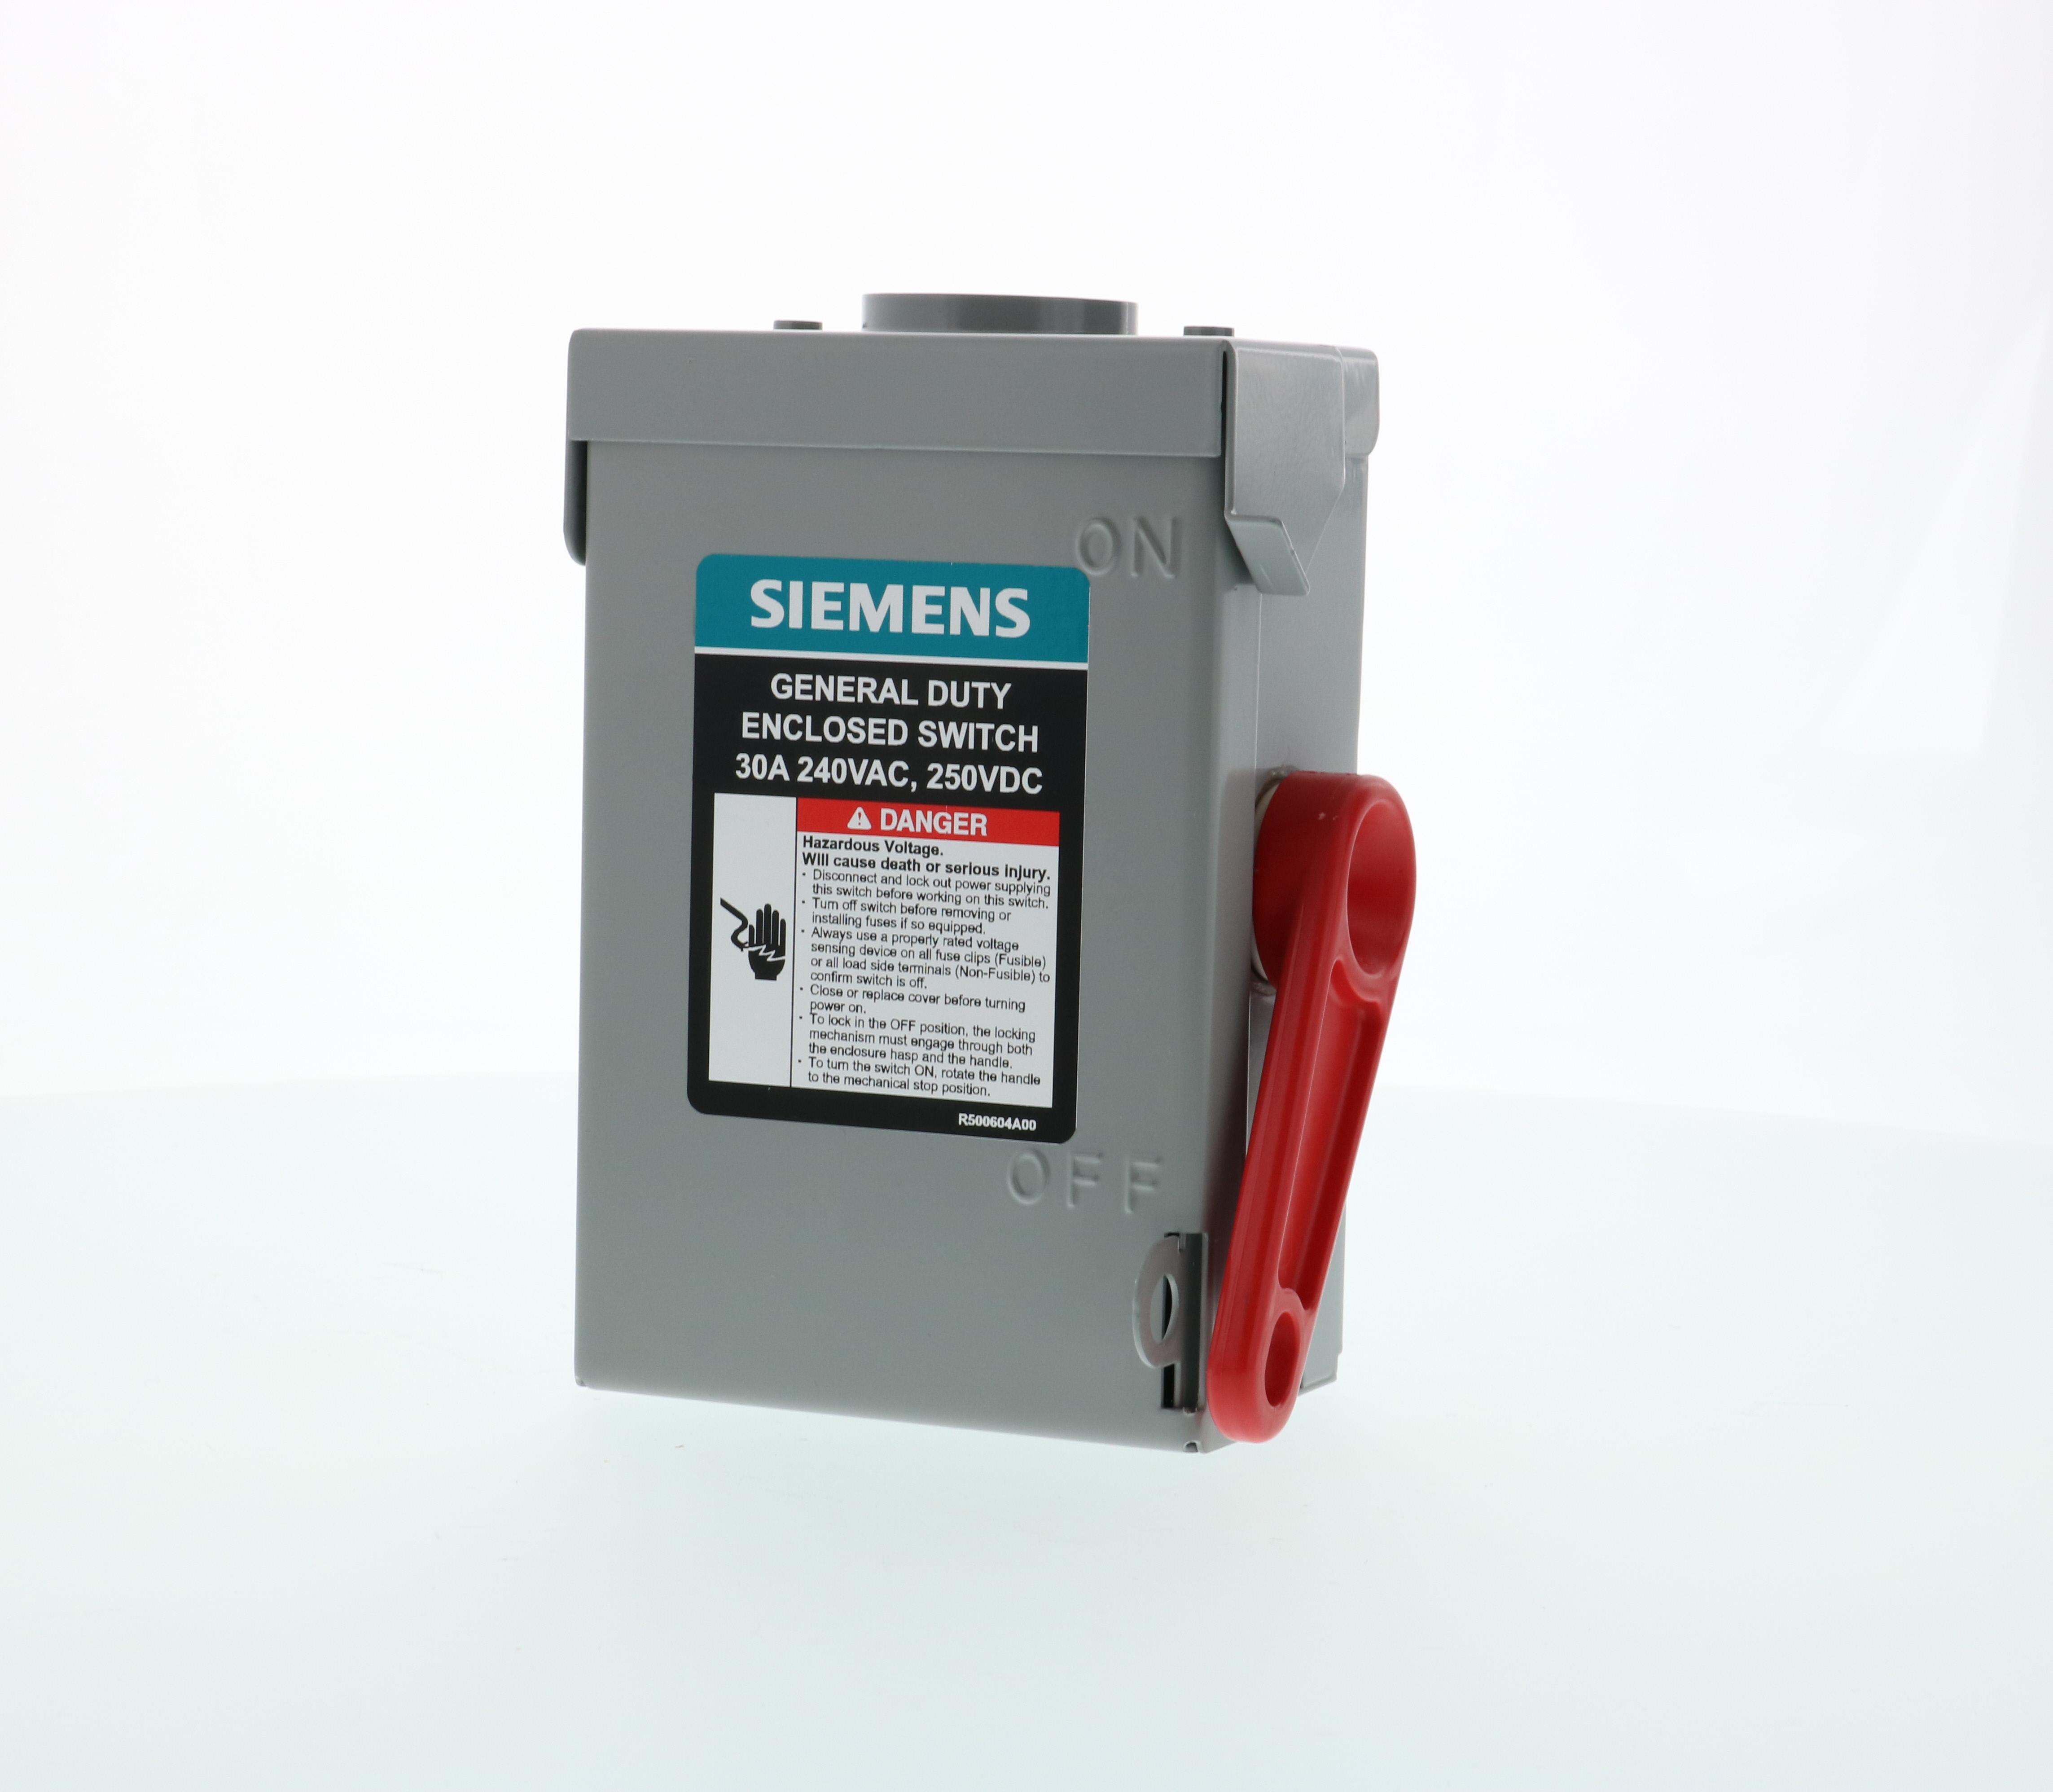 Siemens GNF321RA